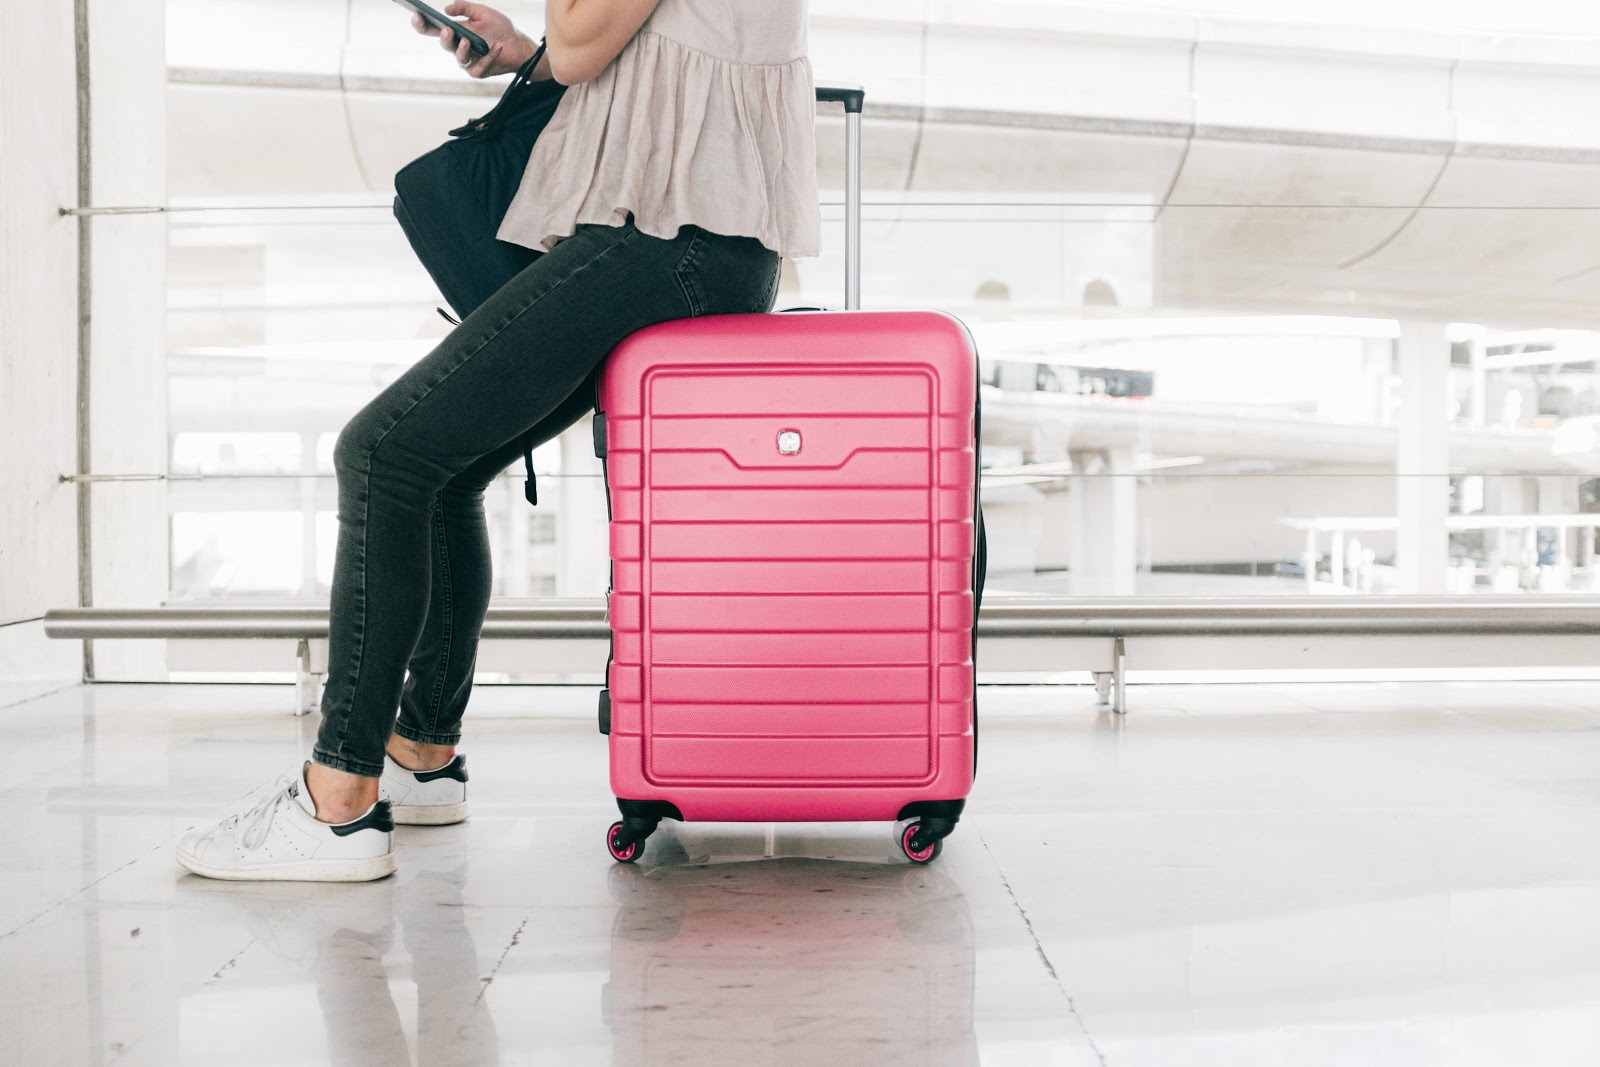 valigia-rosa-ragazza-seduta